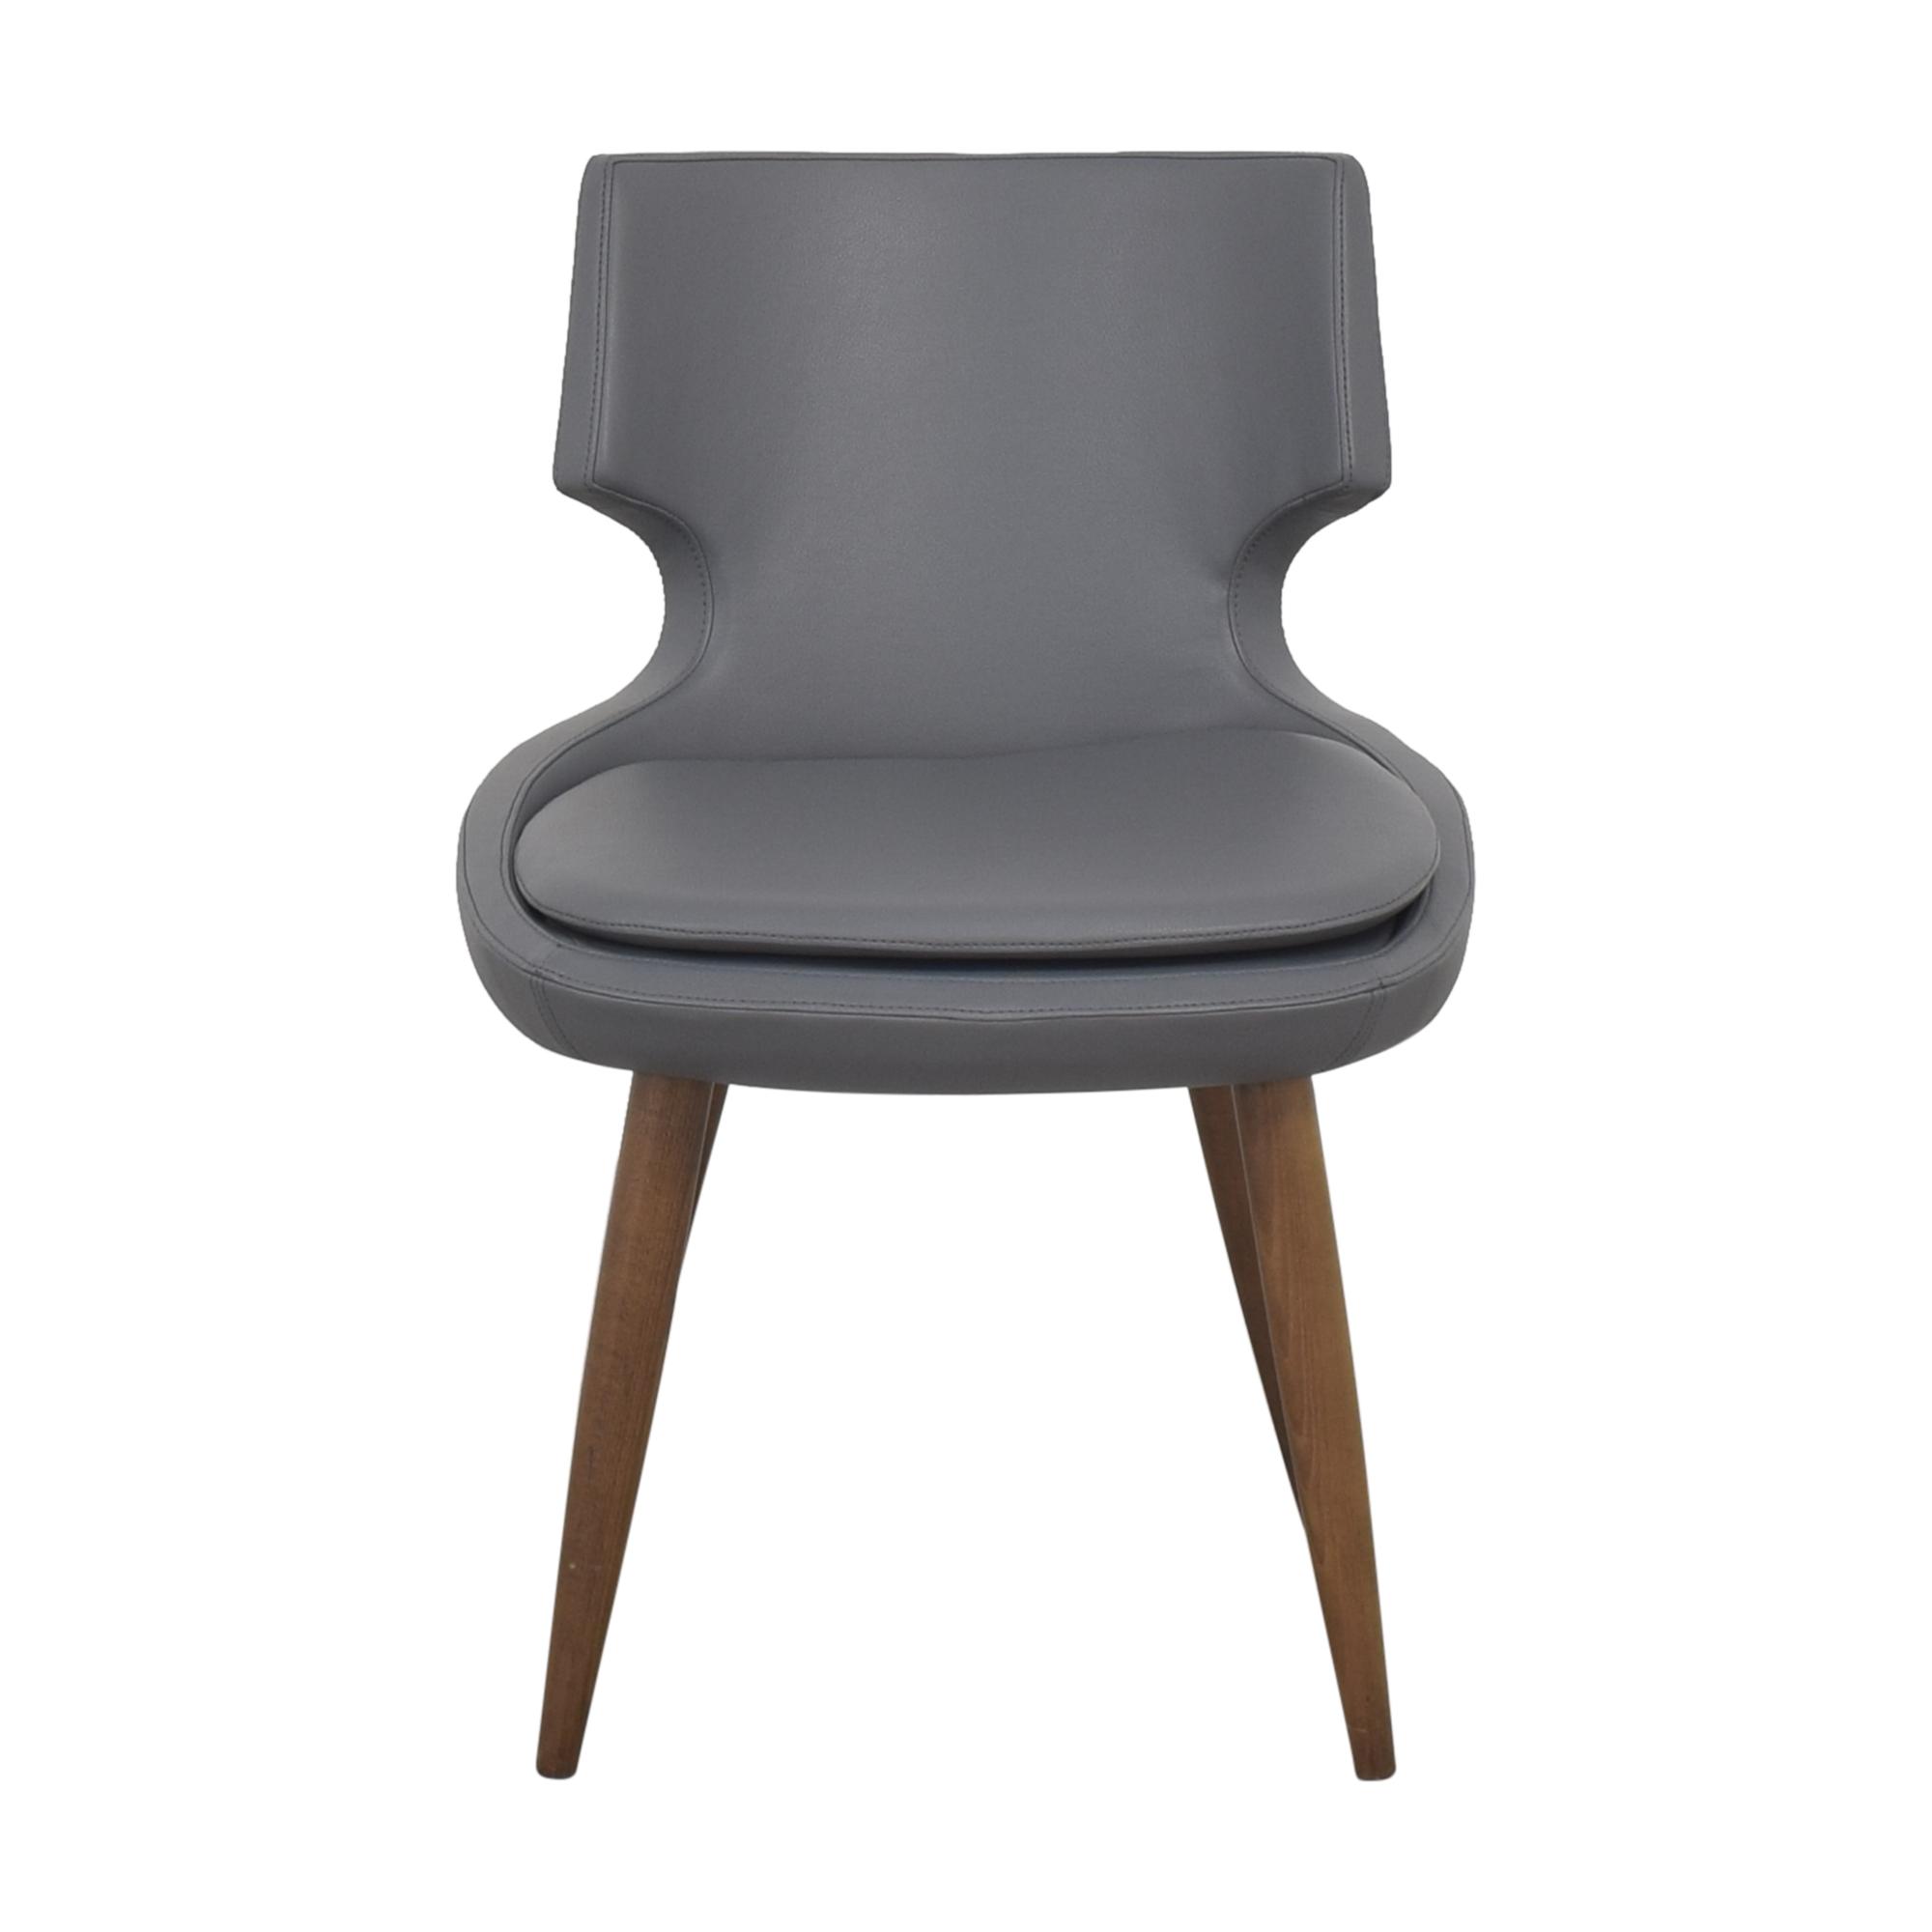 sohoConcept Patara Dining Chair sohoConcept